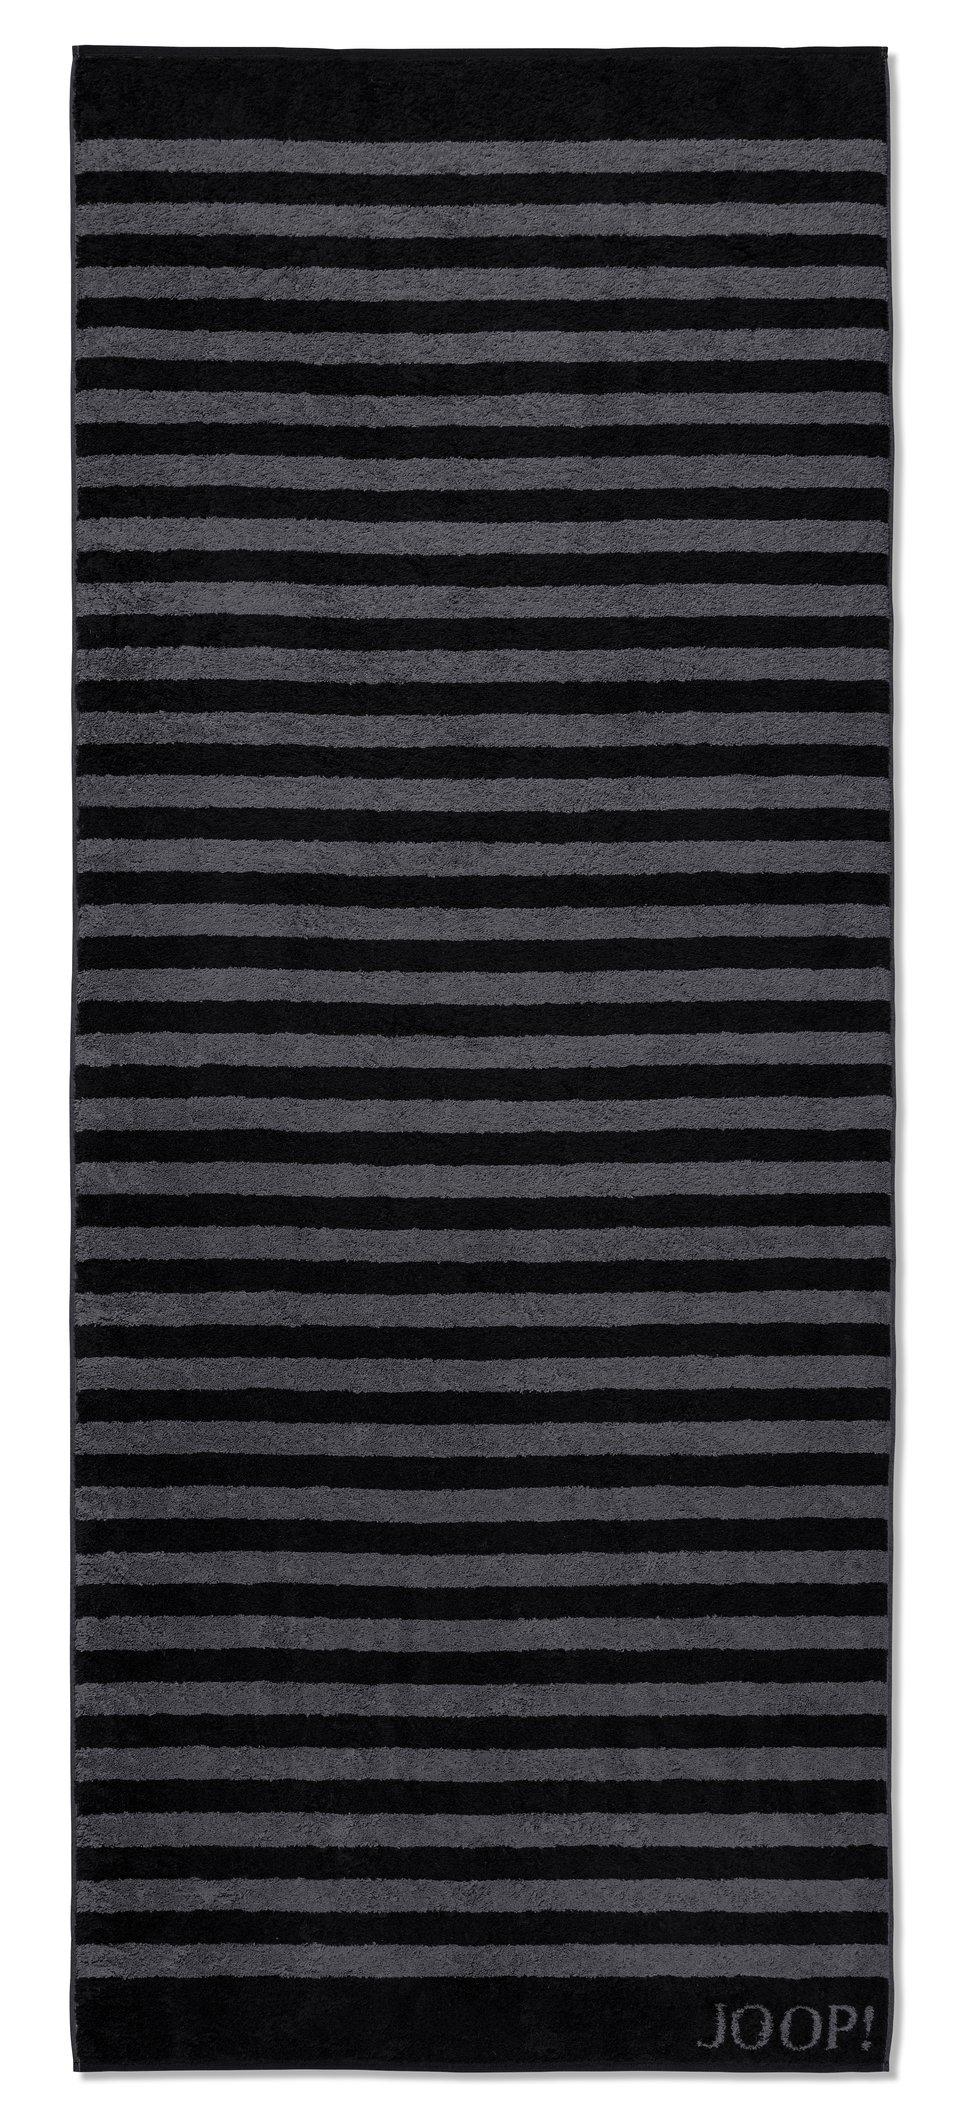 JOOP! Classic Stripes Saunatuch 80x200 cm 1610-90 Schwarz